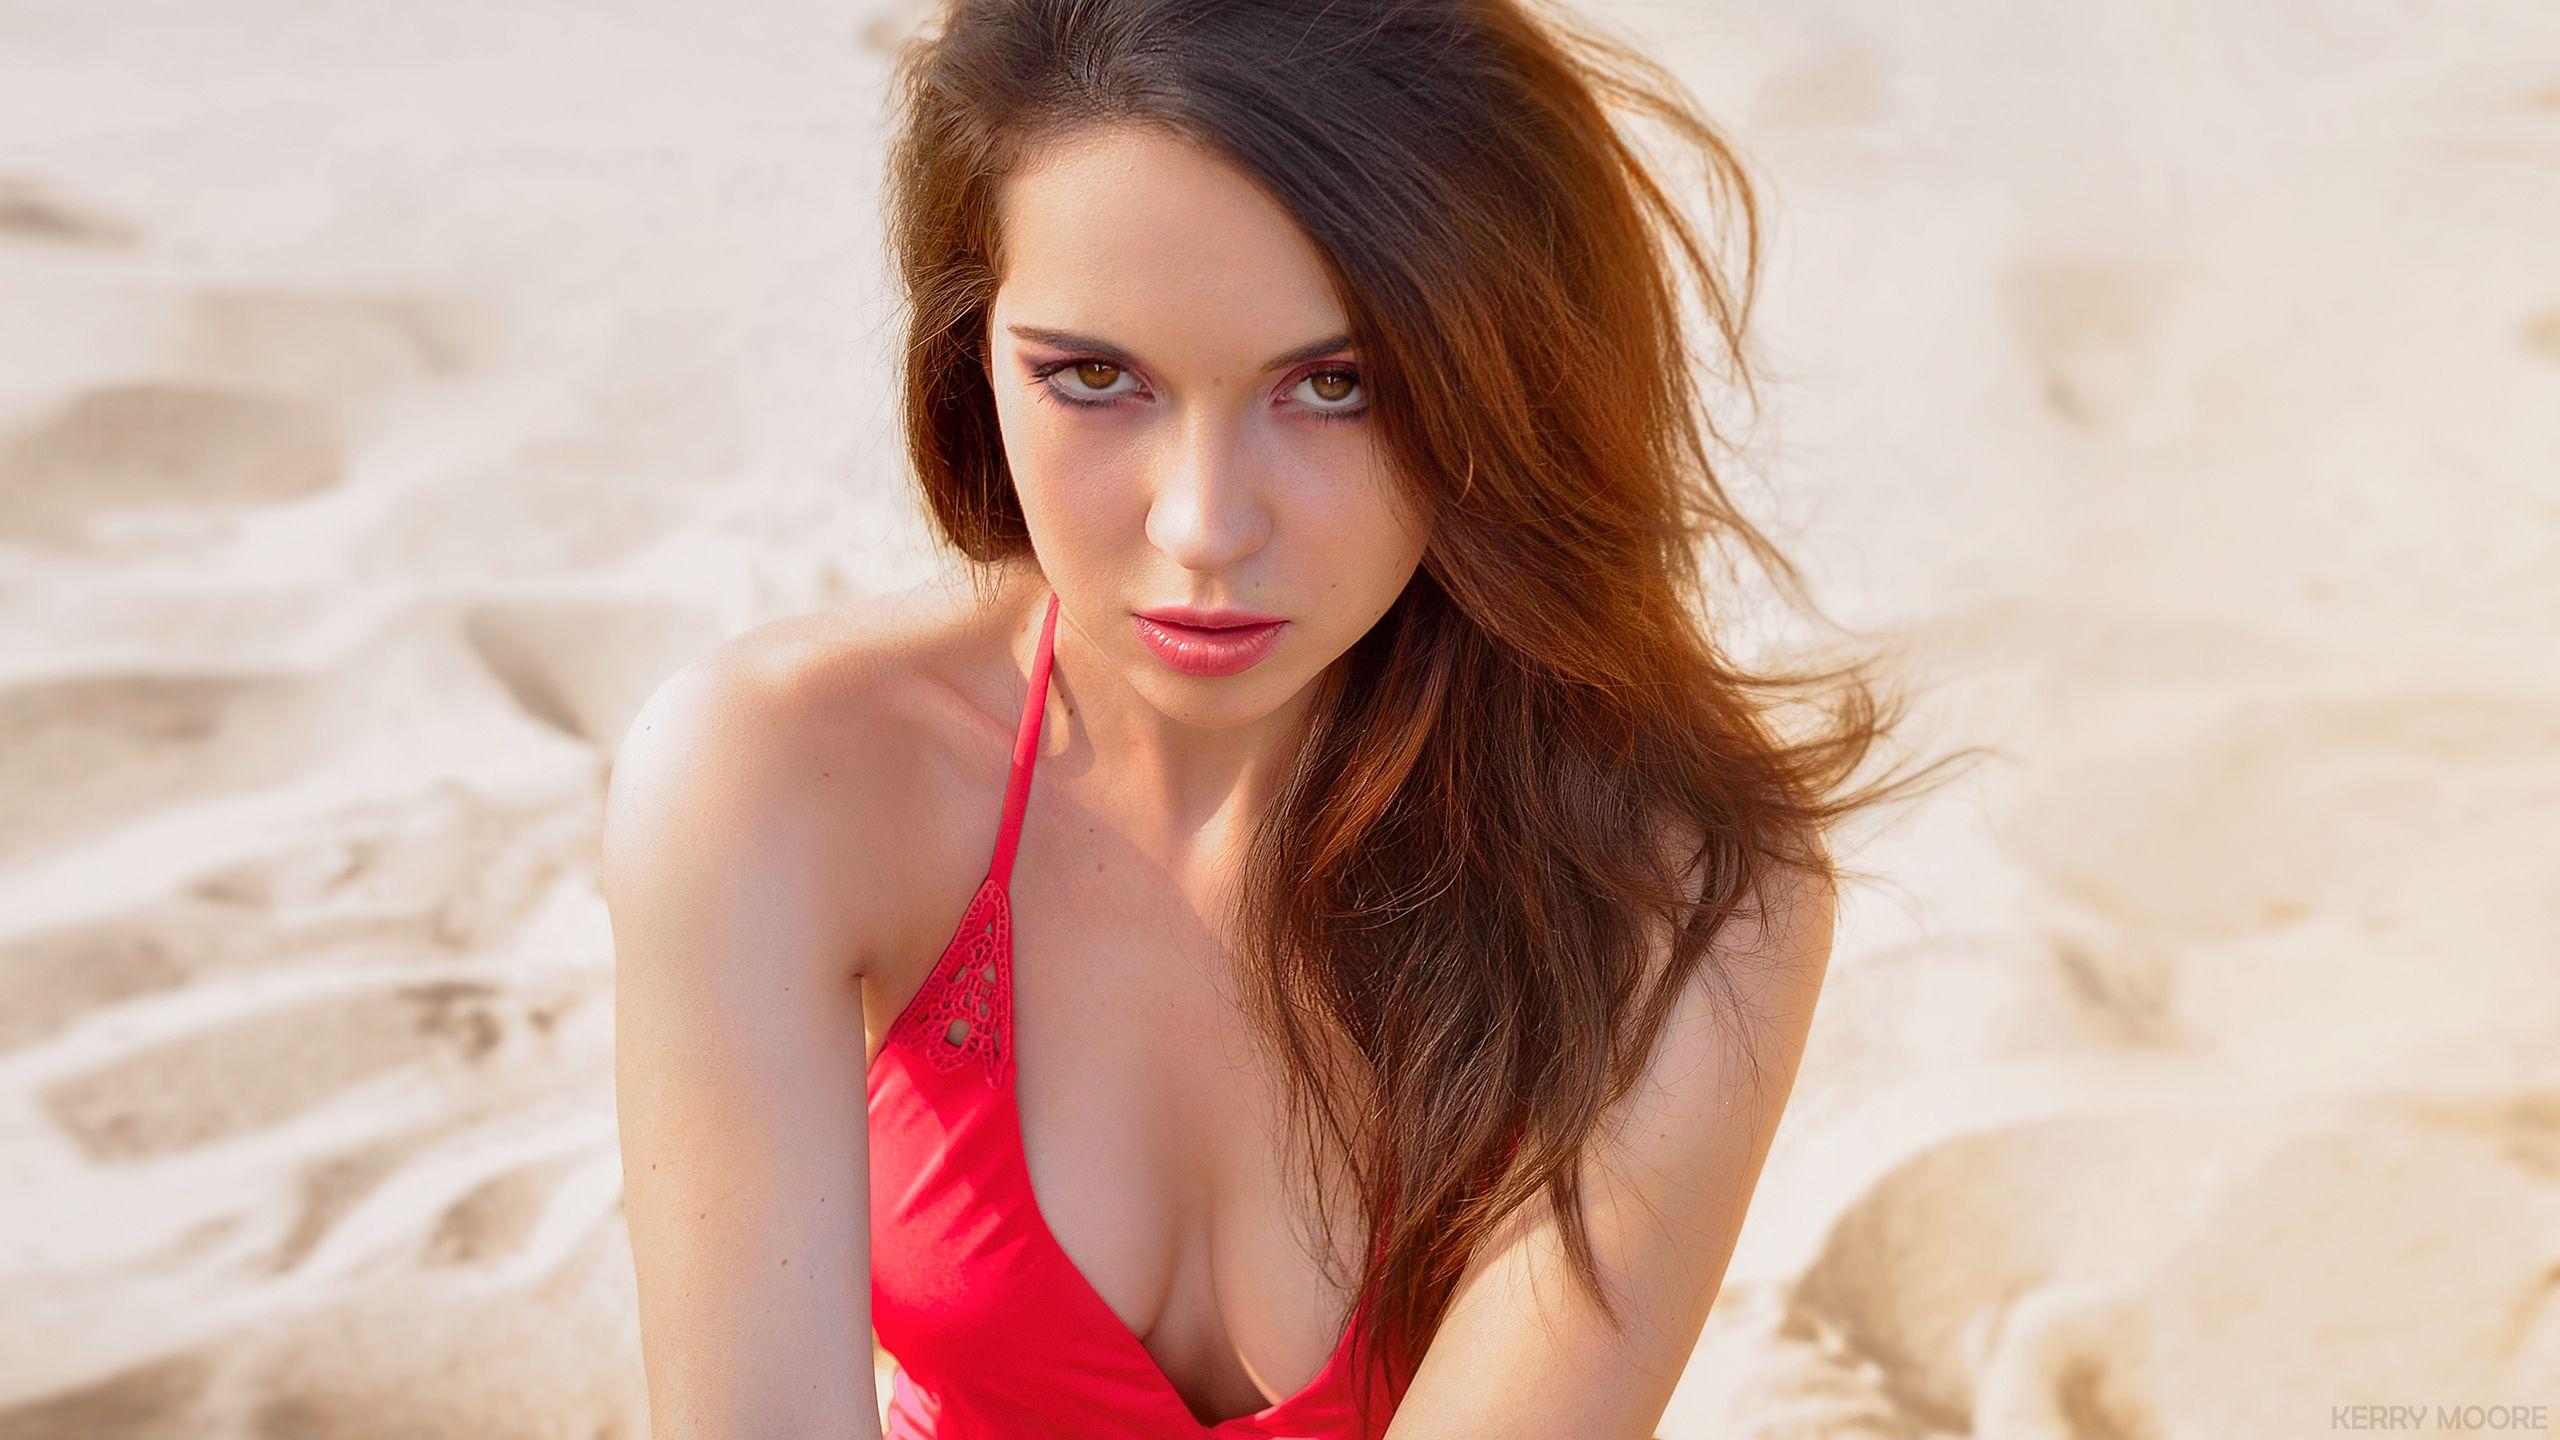 portrait, girl, style, портрет, model, russia,moscow, пляж, лето,девушка,  Kerry Moore